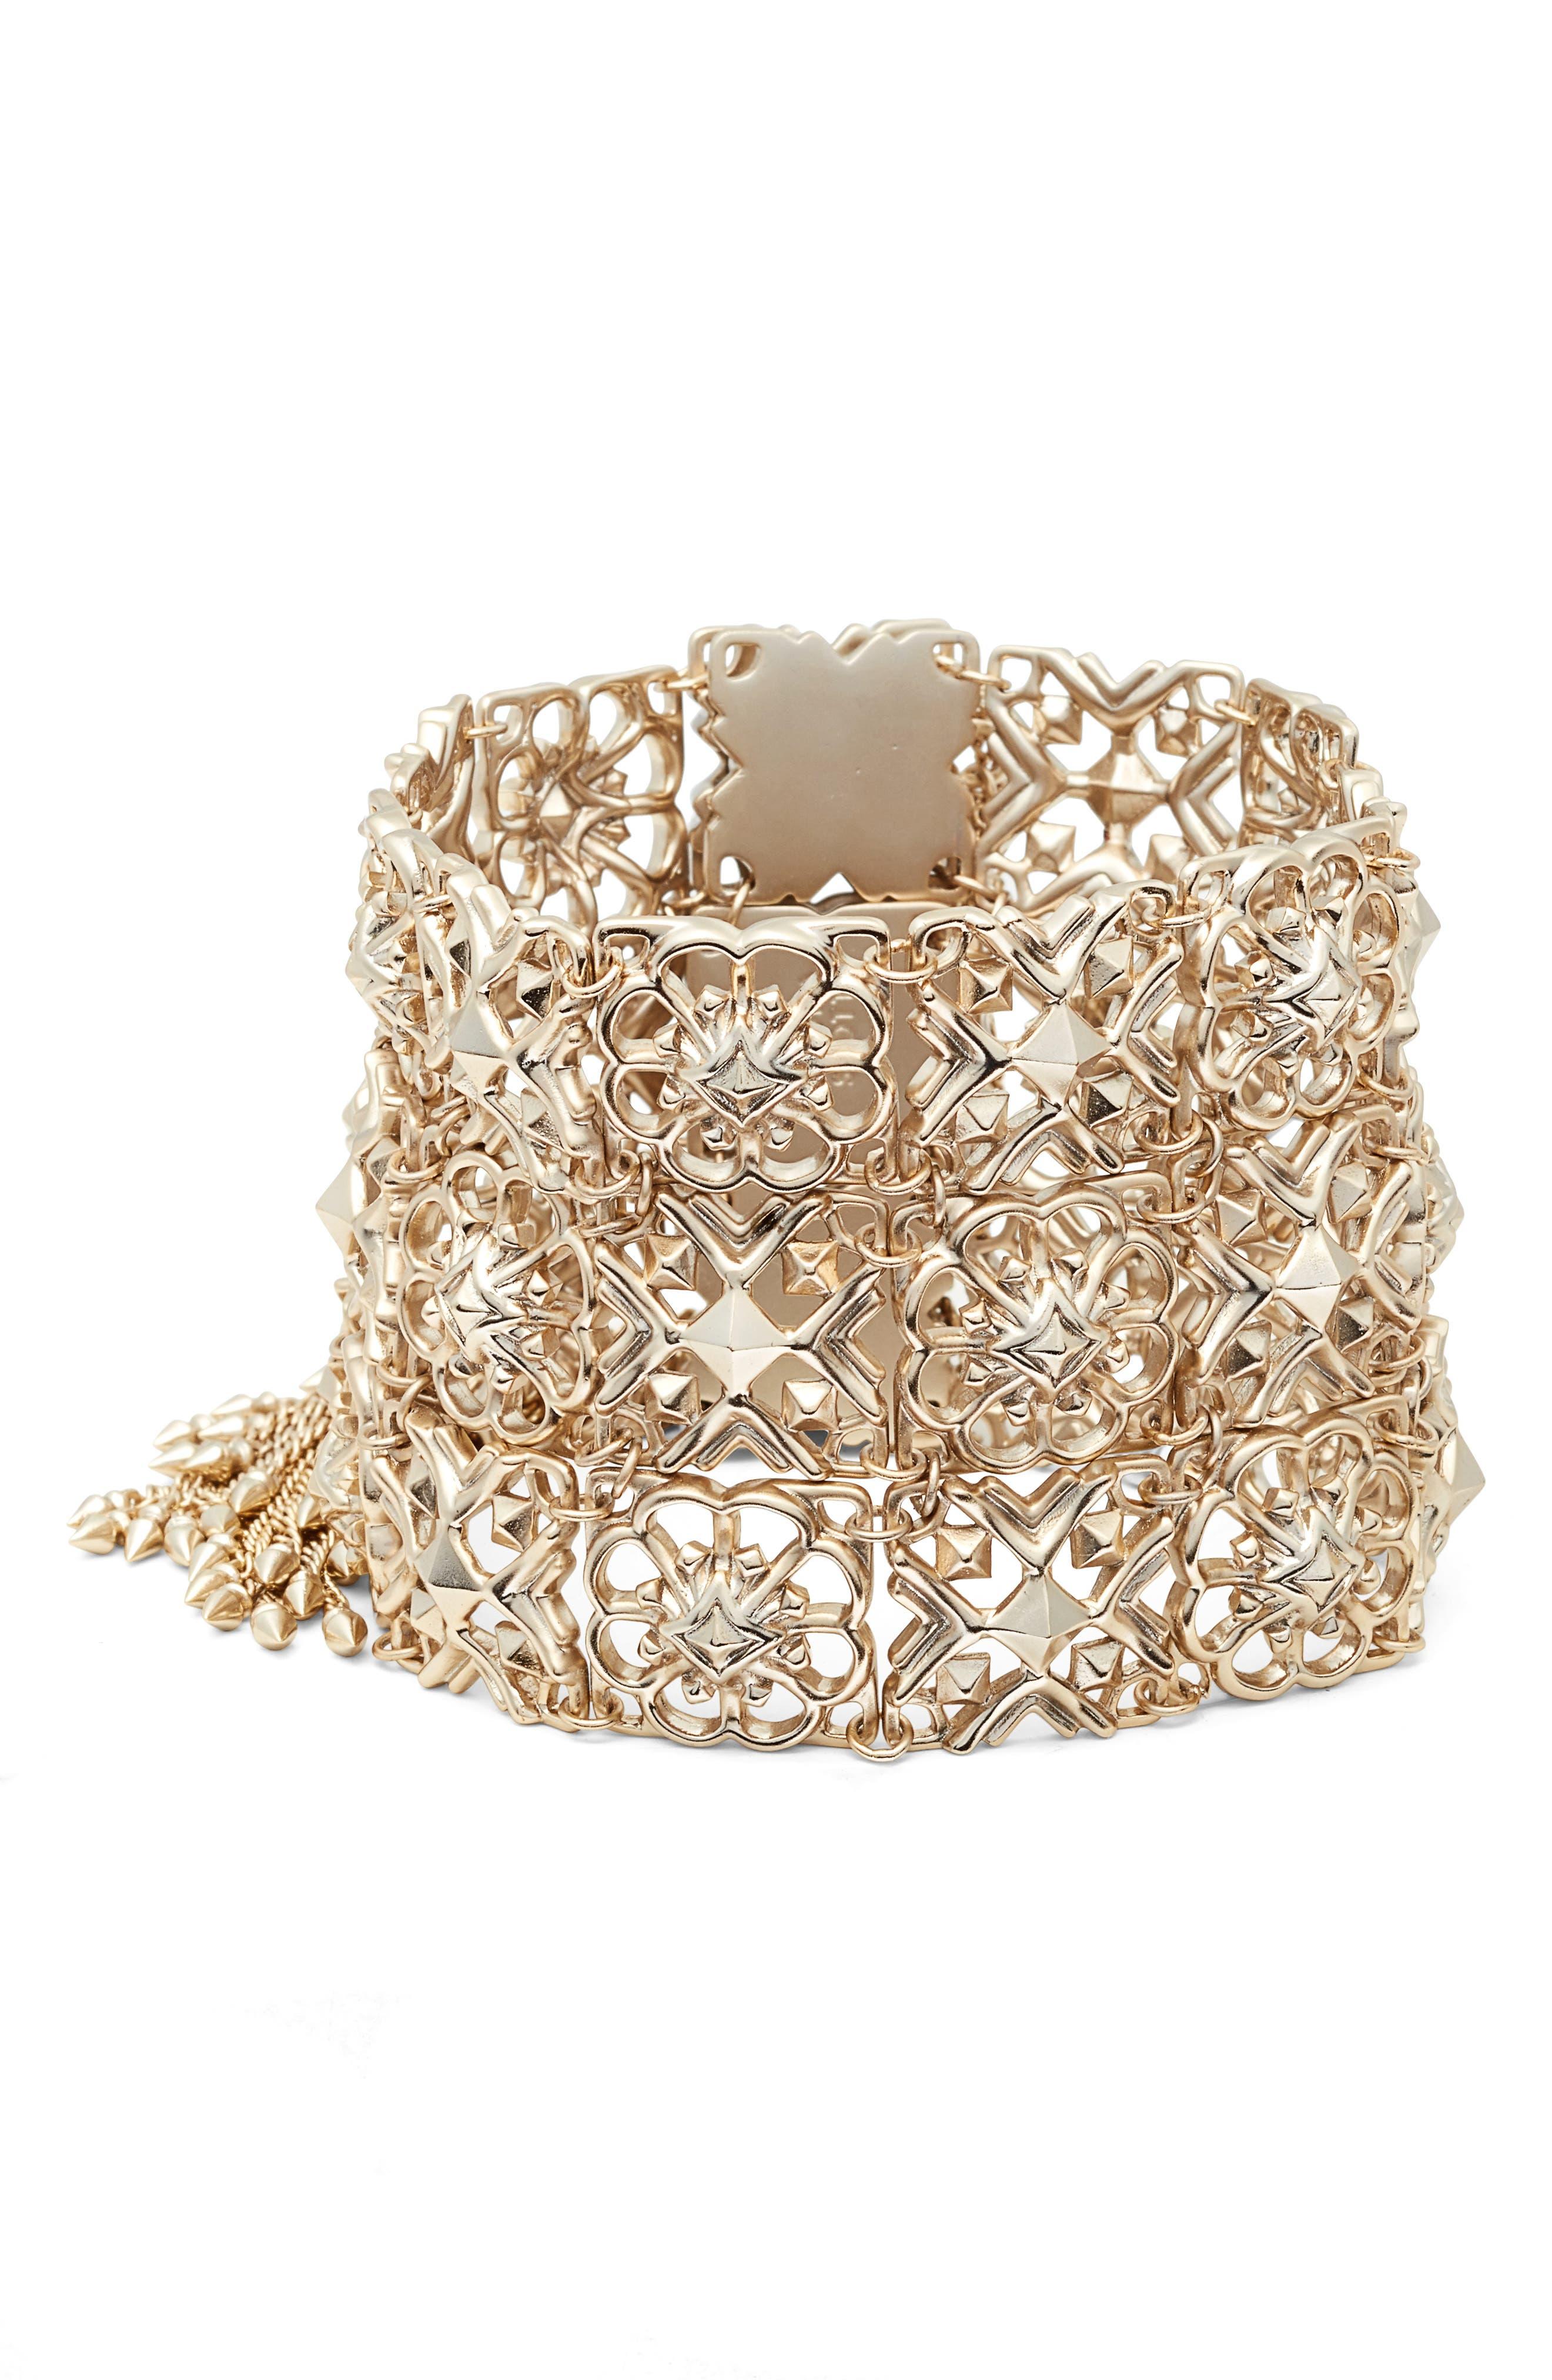 Main Image - Kendra Scott Iris Wide Bracelet